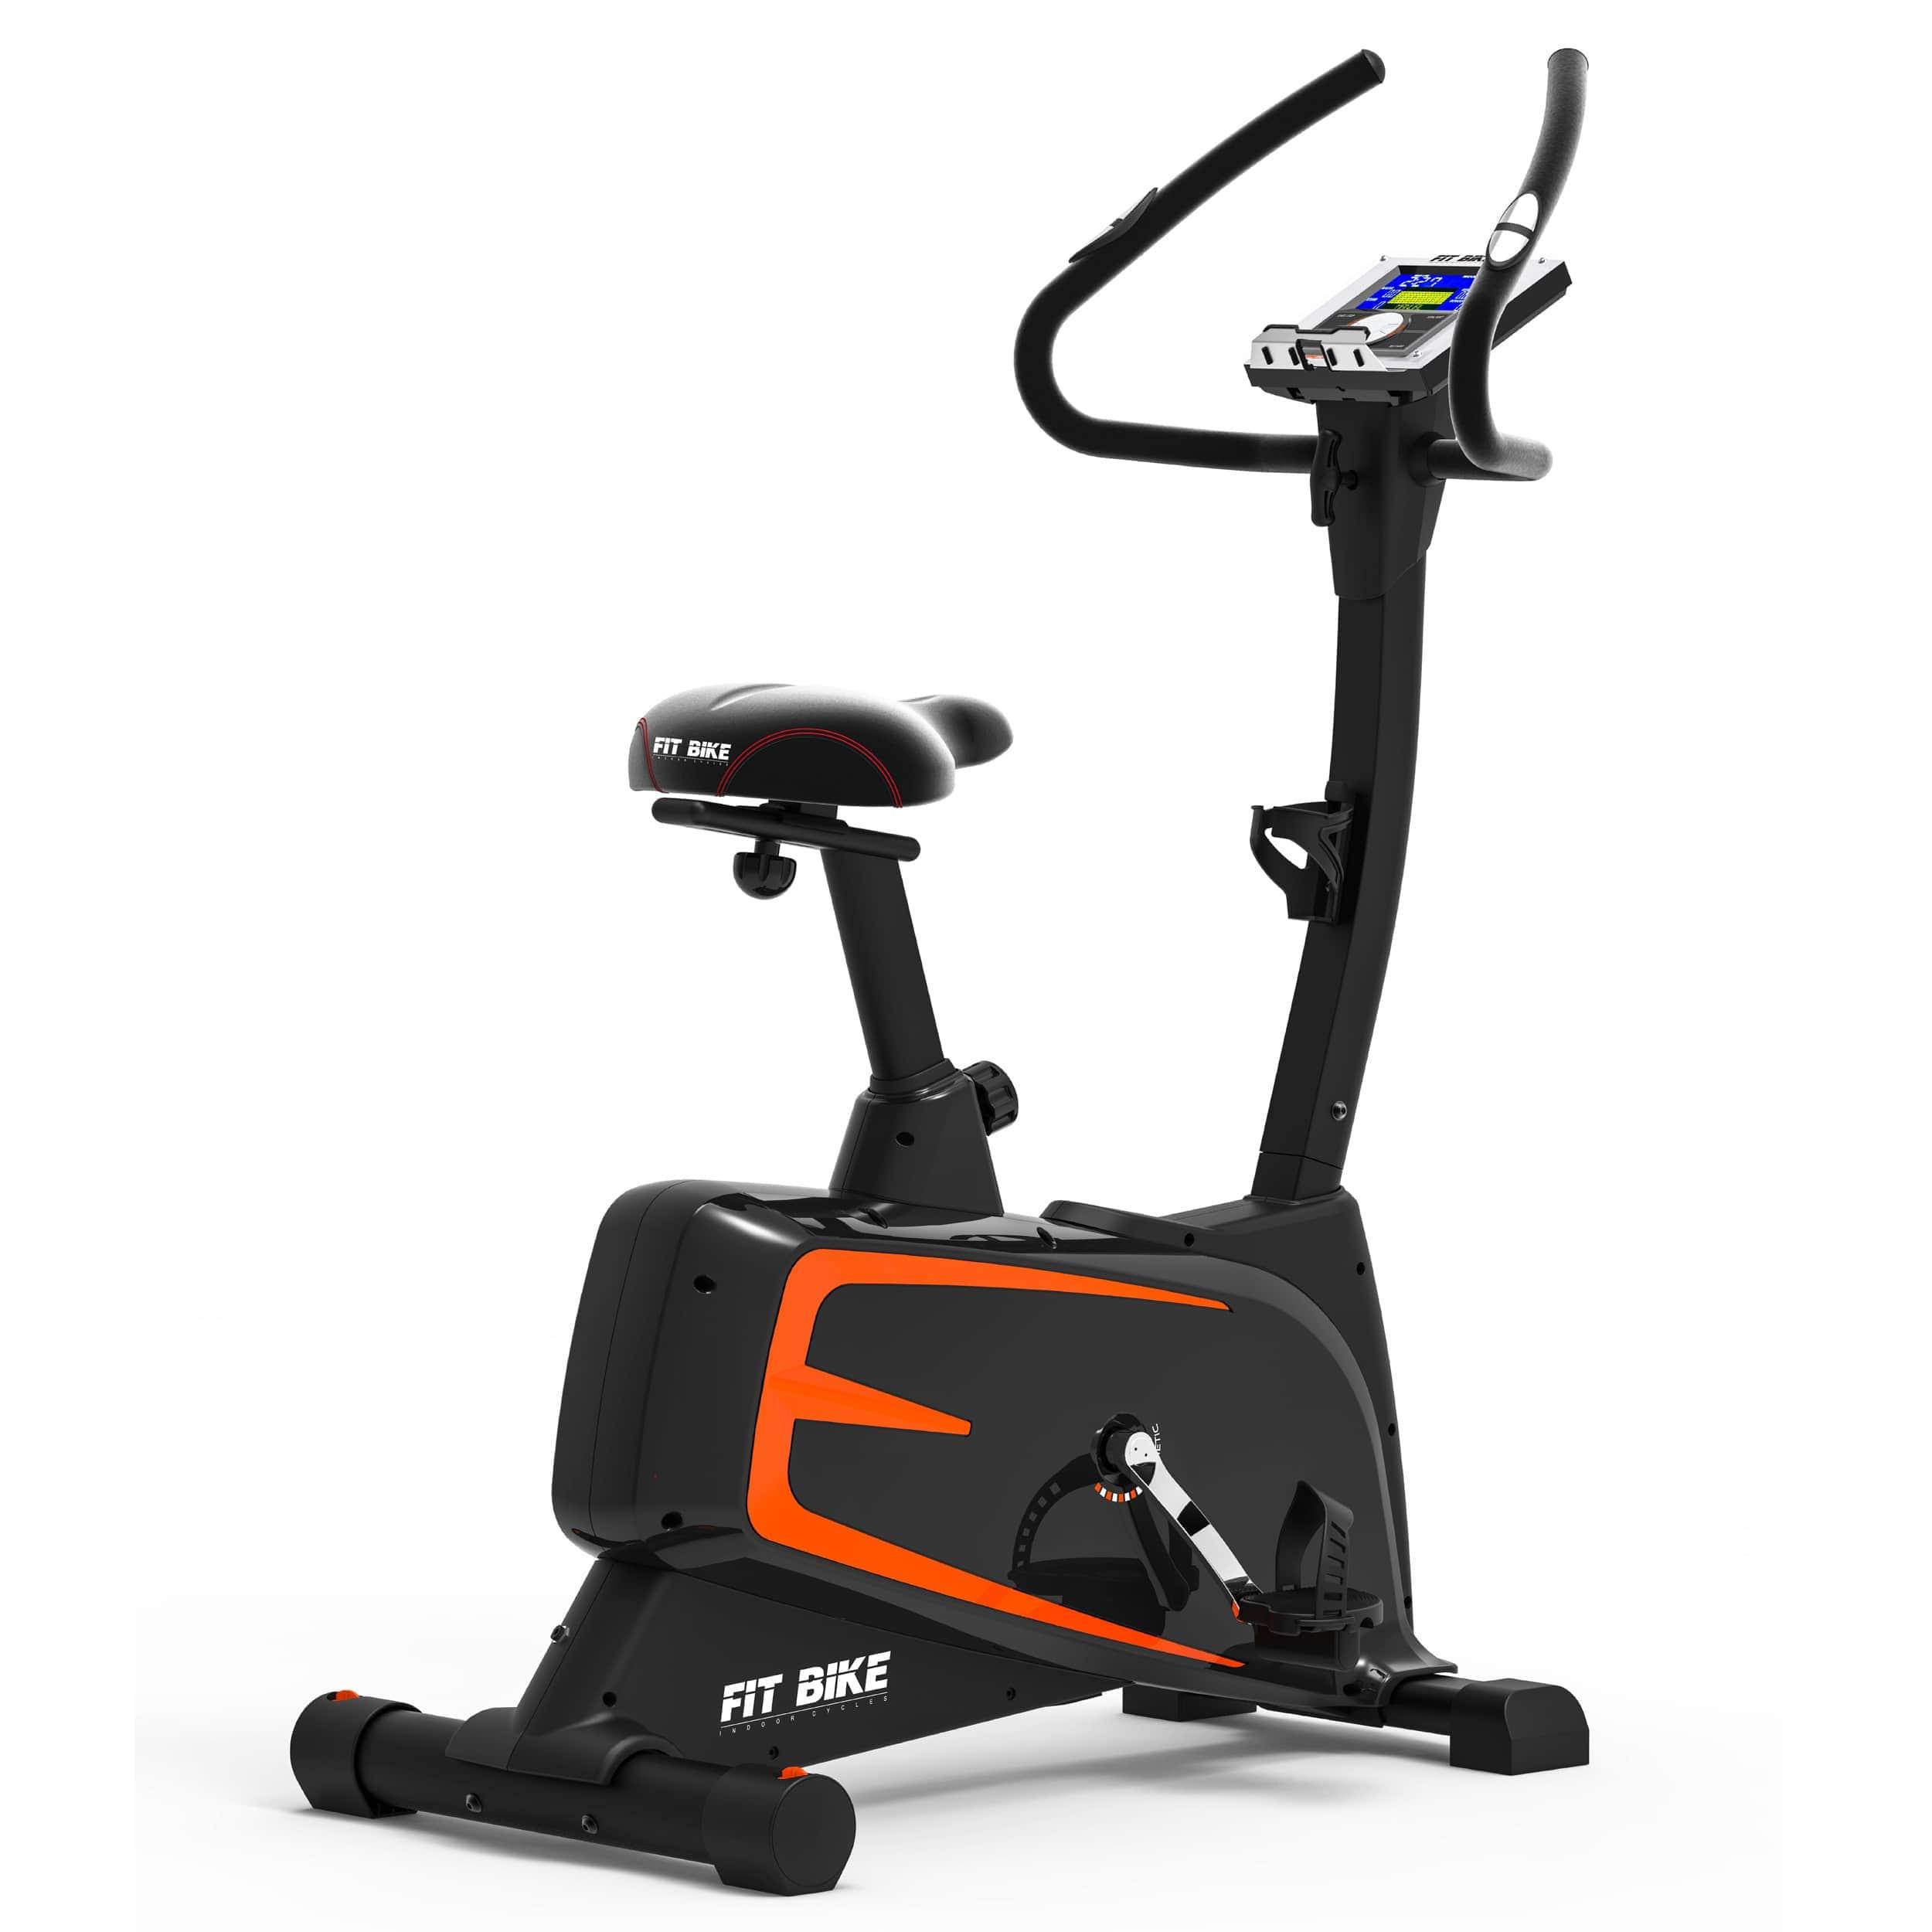 fitbike ride 6 hometrainer afbeelding